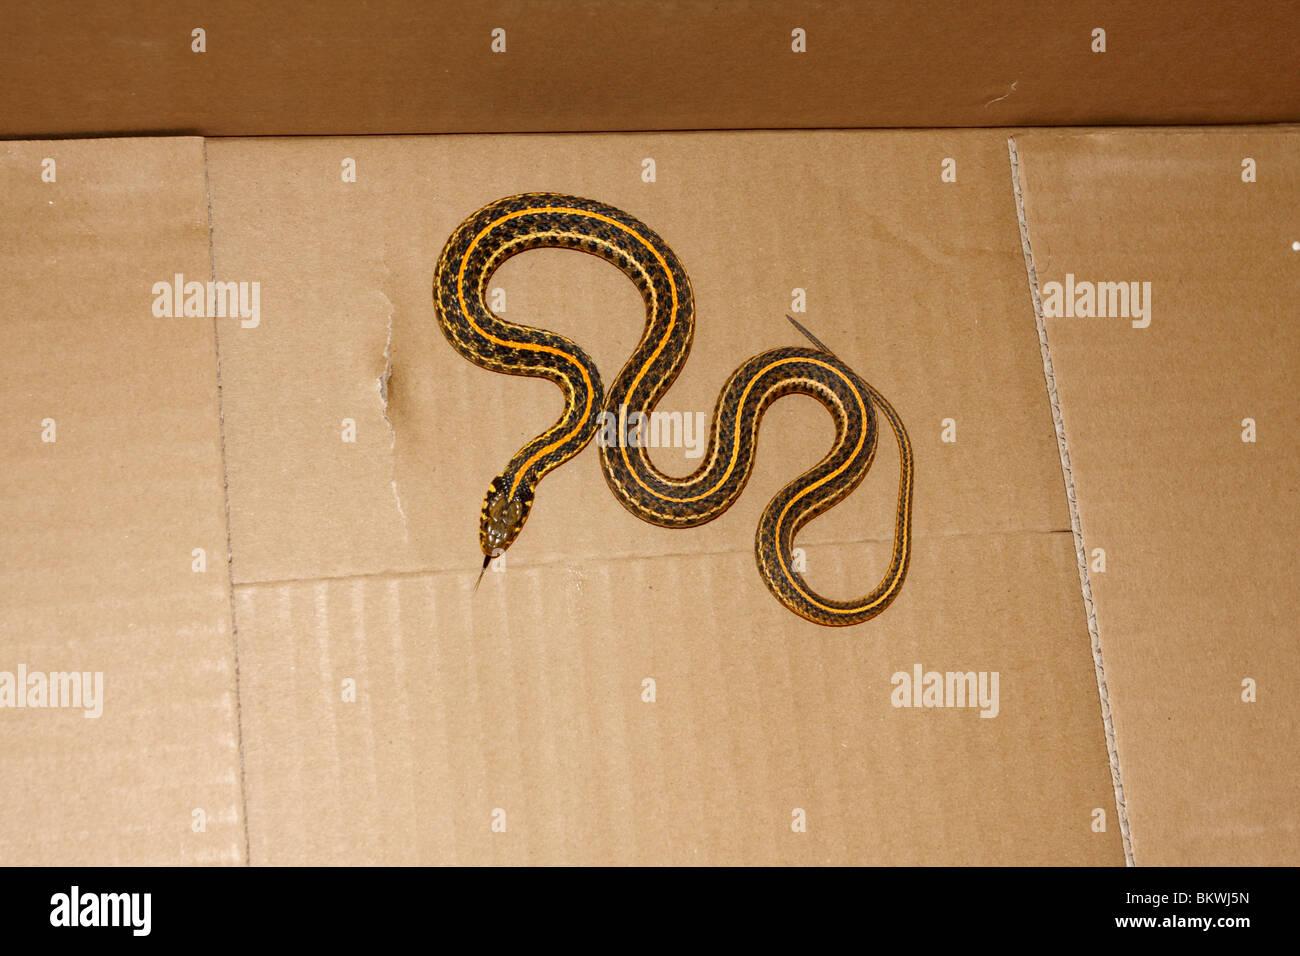 small garden snake in corrugated cardboard box stock photo 29451905